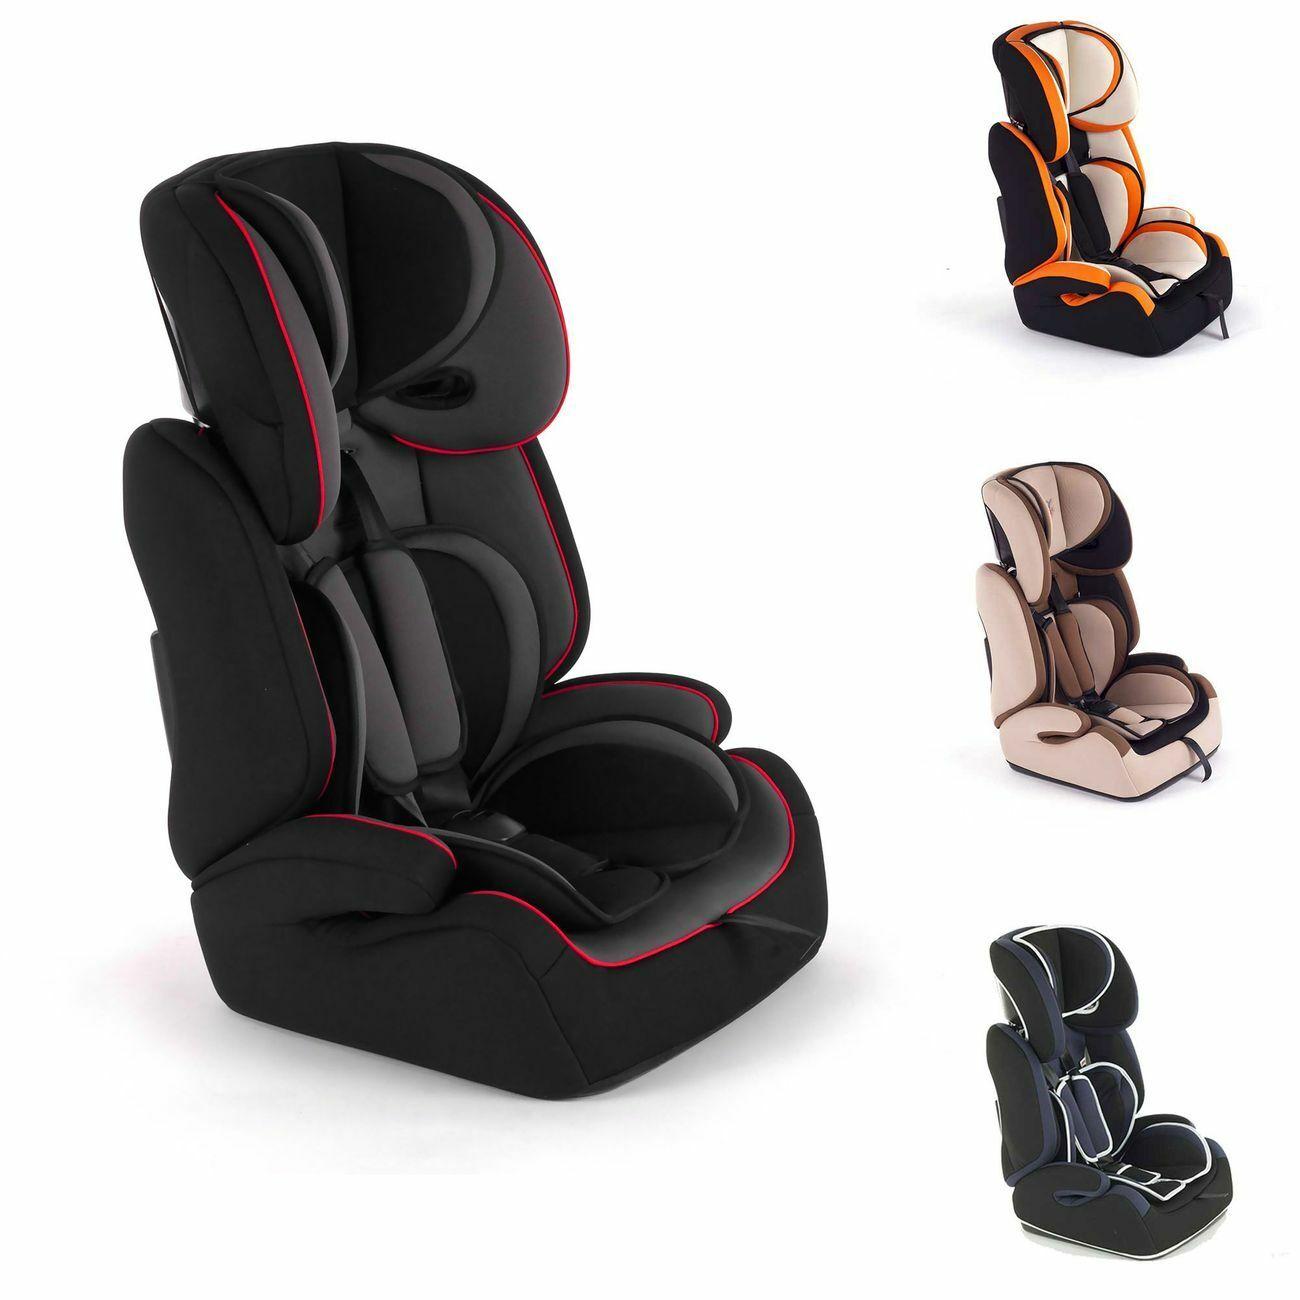 Kindersitz 9-36 kg Autokindersitz Autositz Gruppe 1+2+3 Baby Vivo Farbauswahl